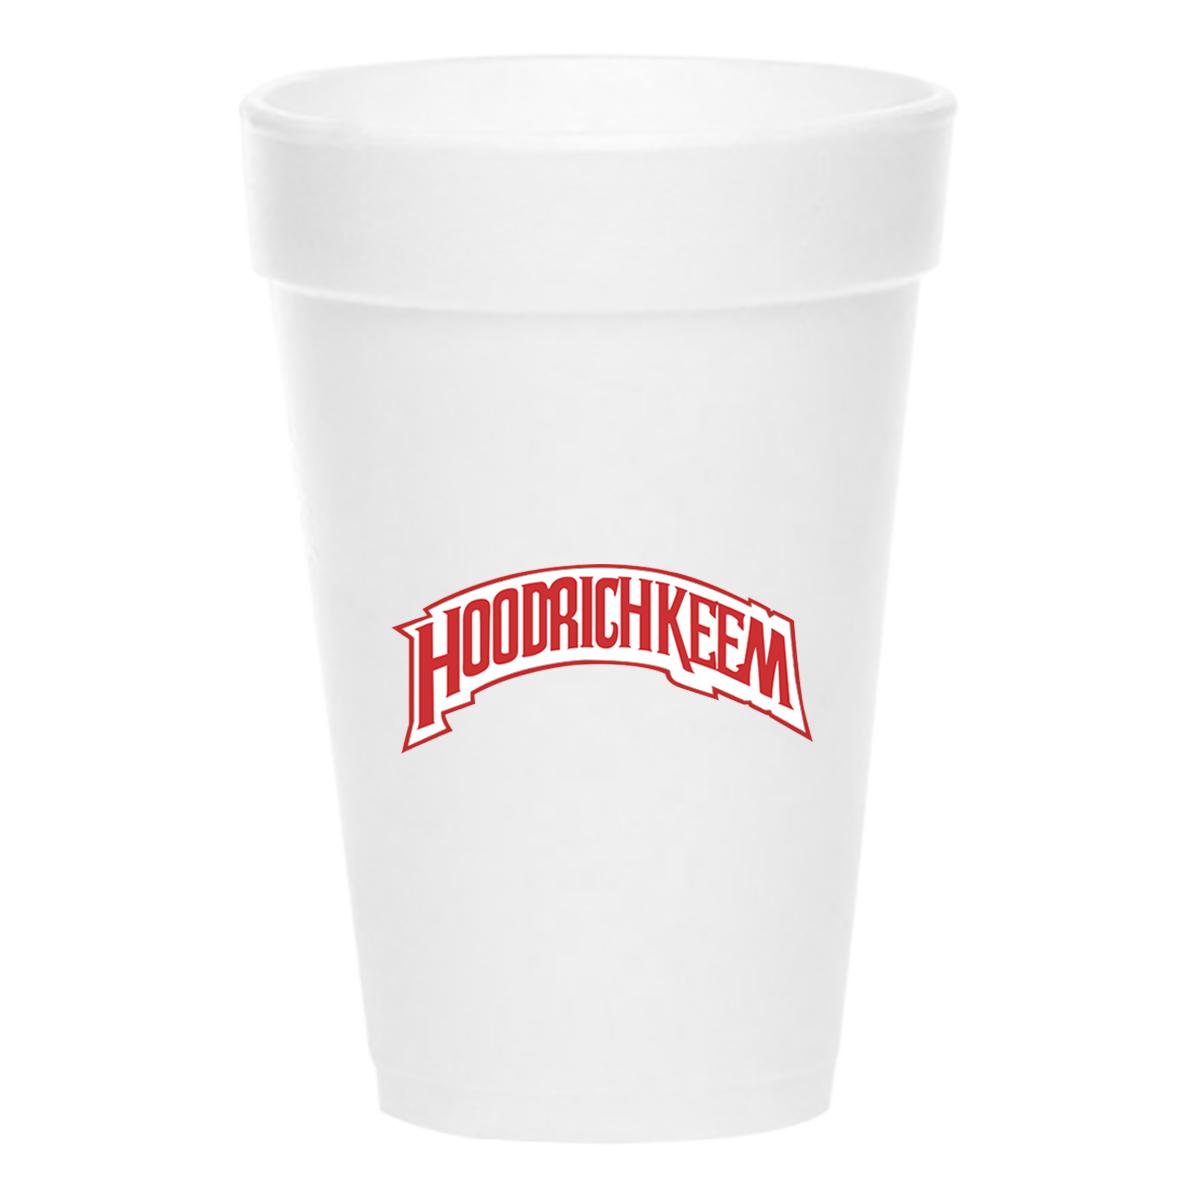 HoodrichKeem Styrofoam Cup